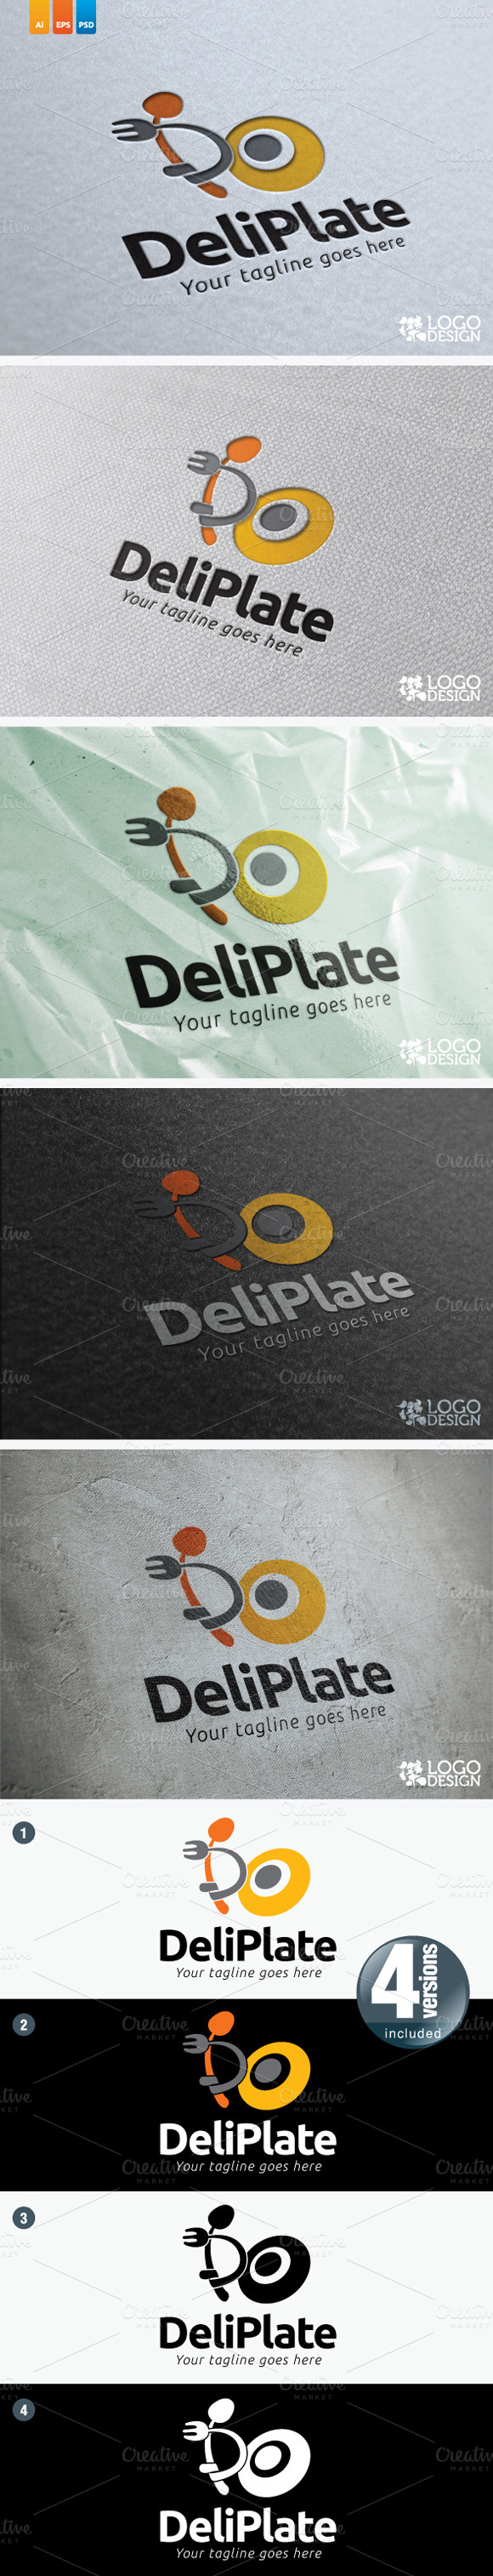 DeliPlate